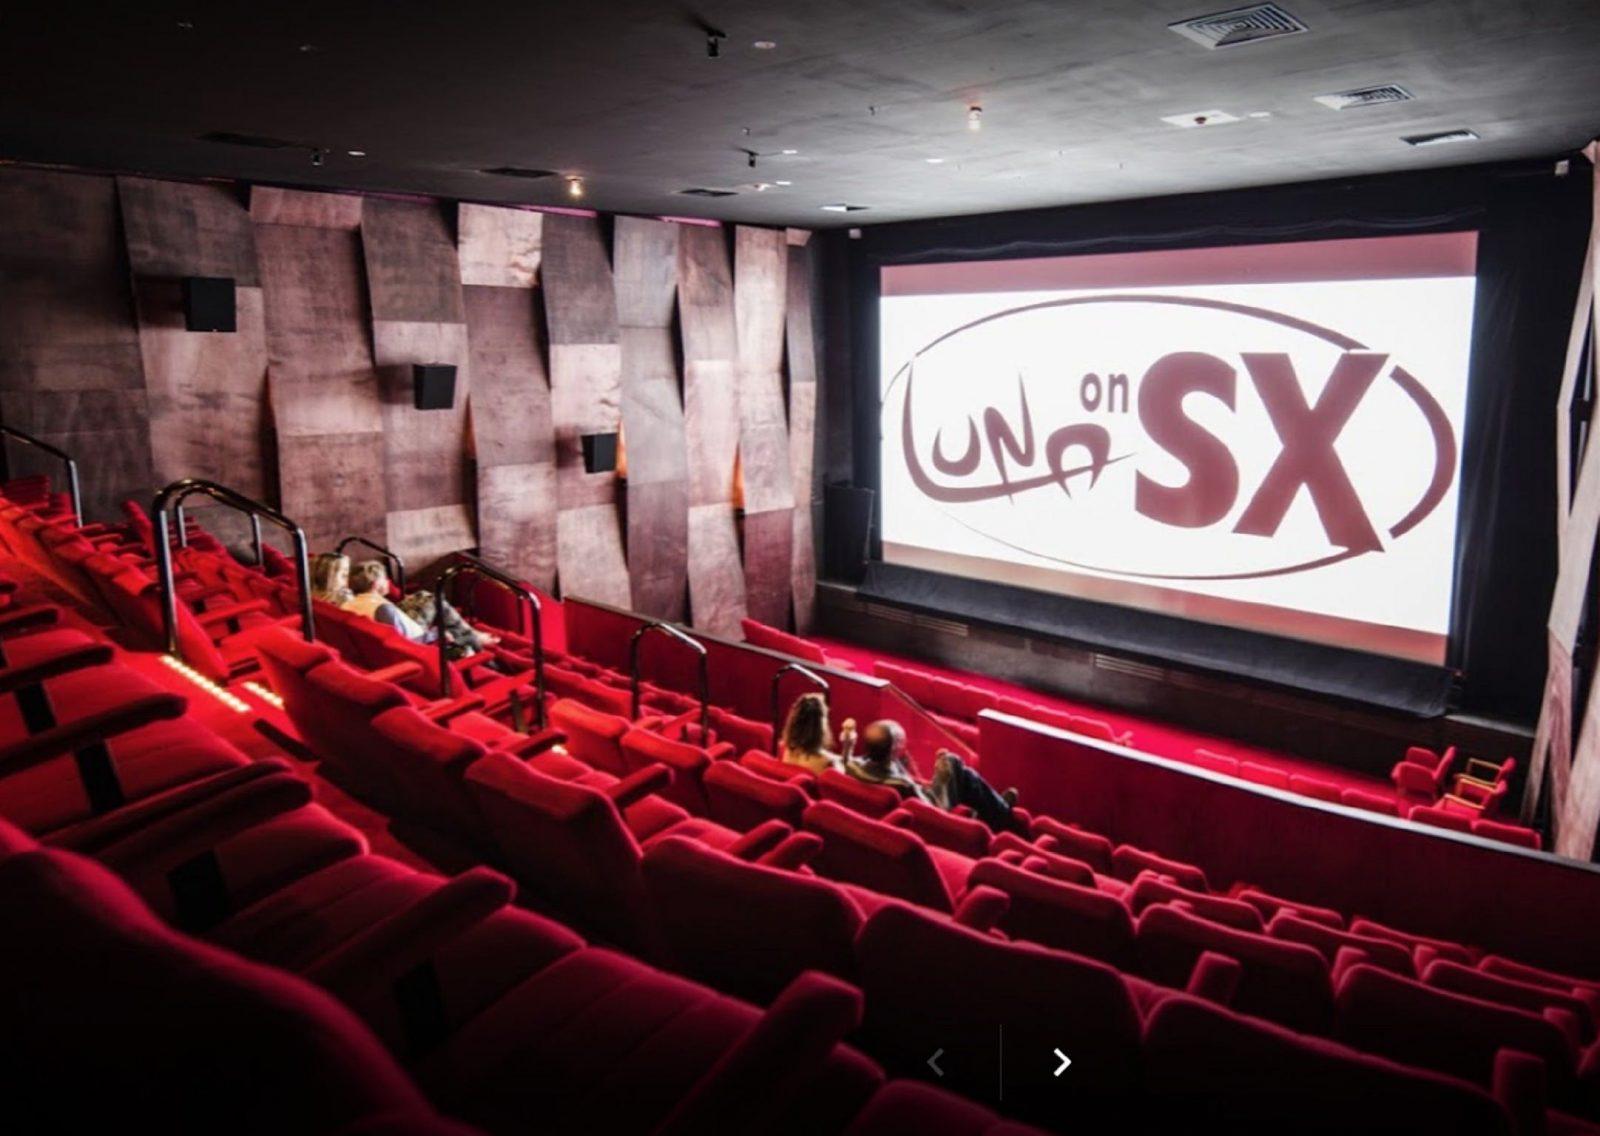 Luna on SX Cinema, Fremantle, Western Australia